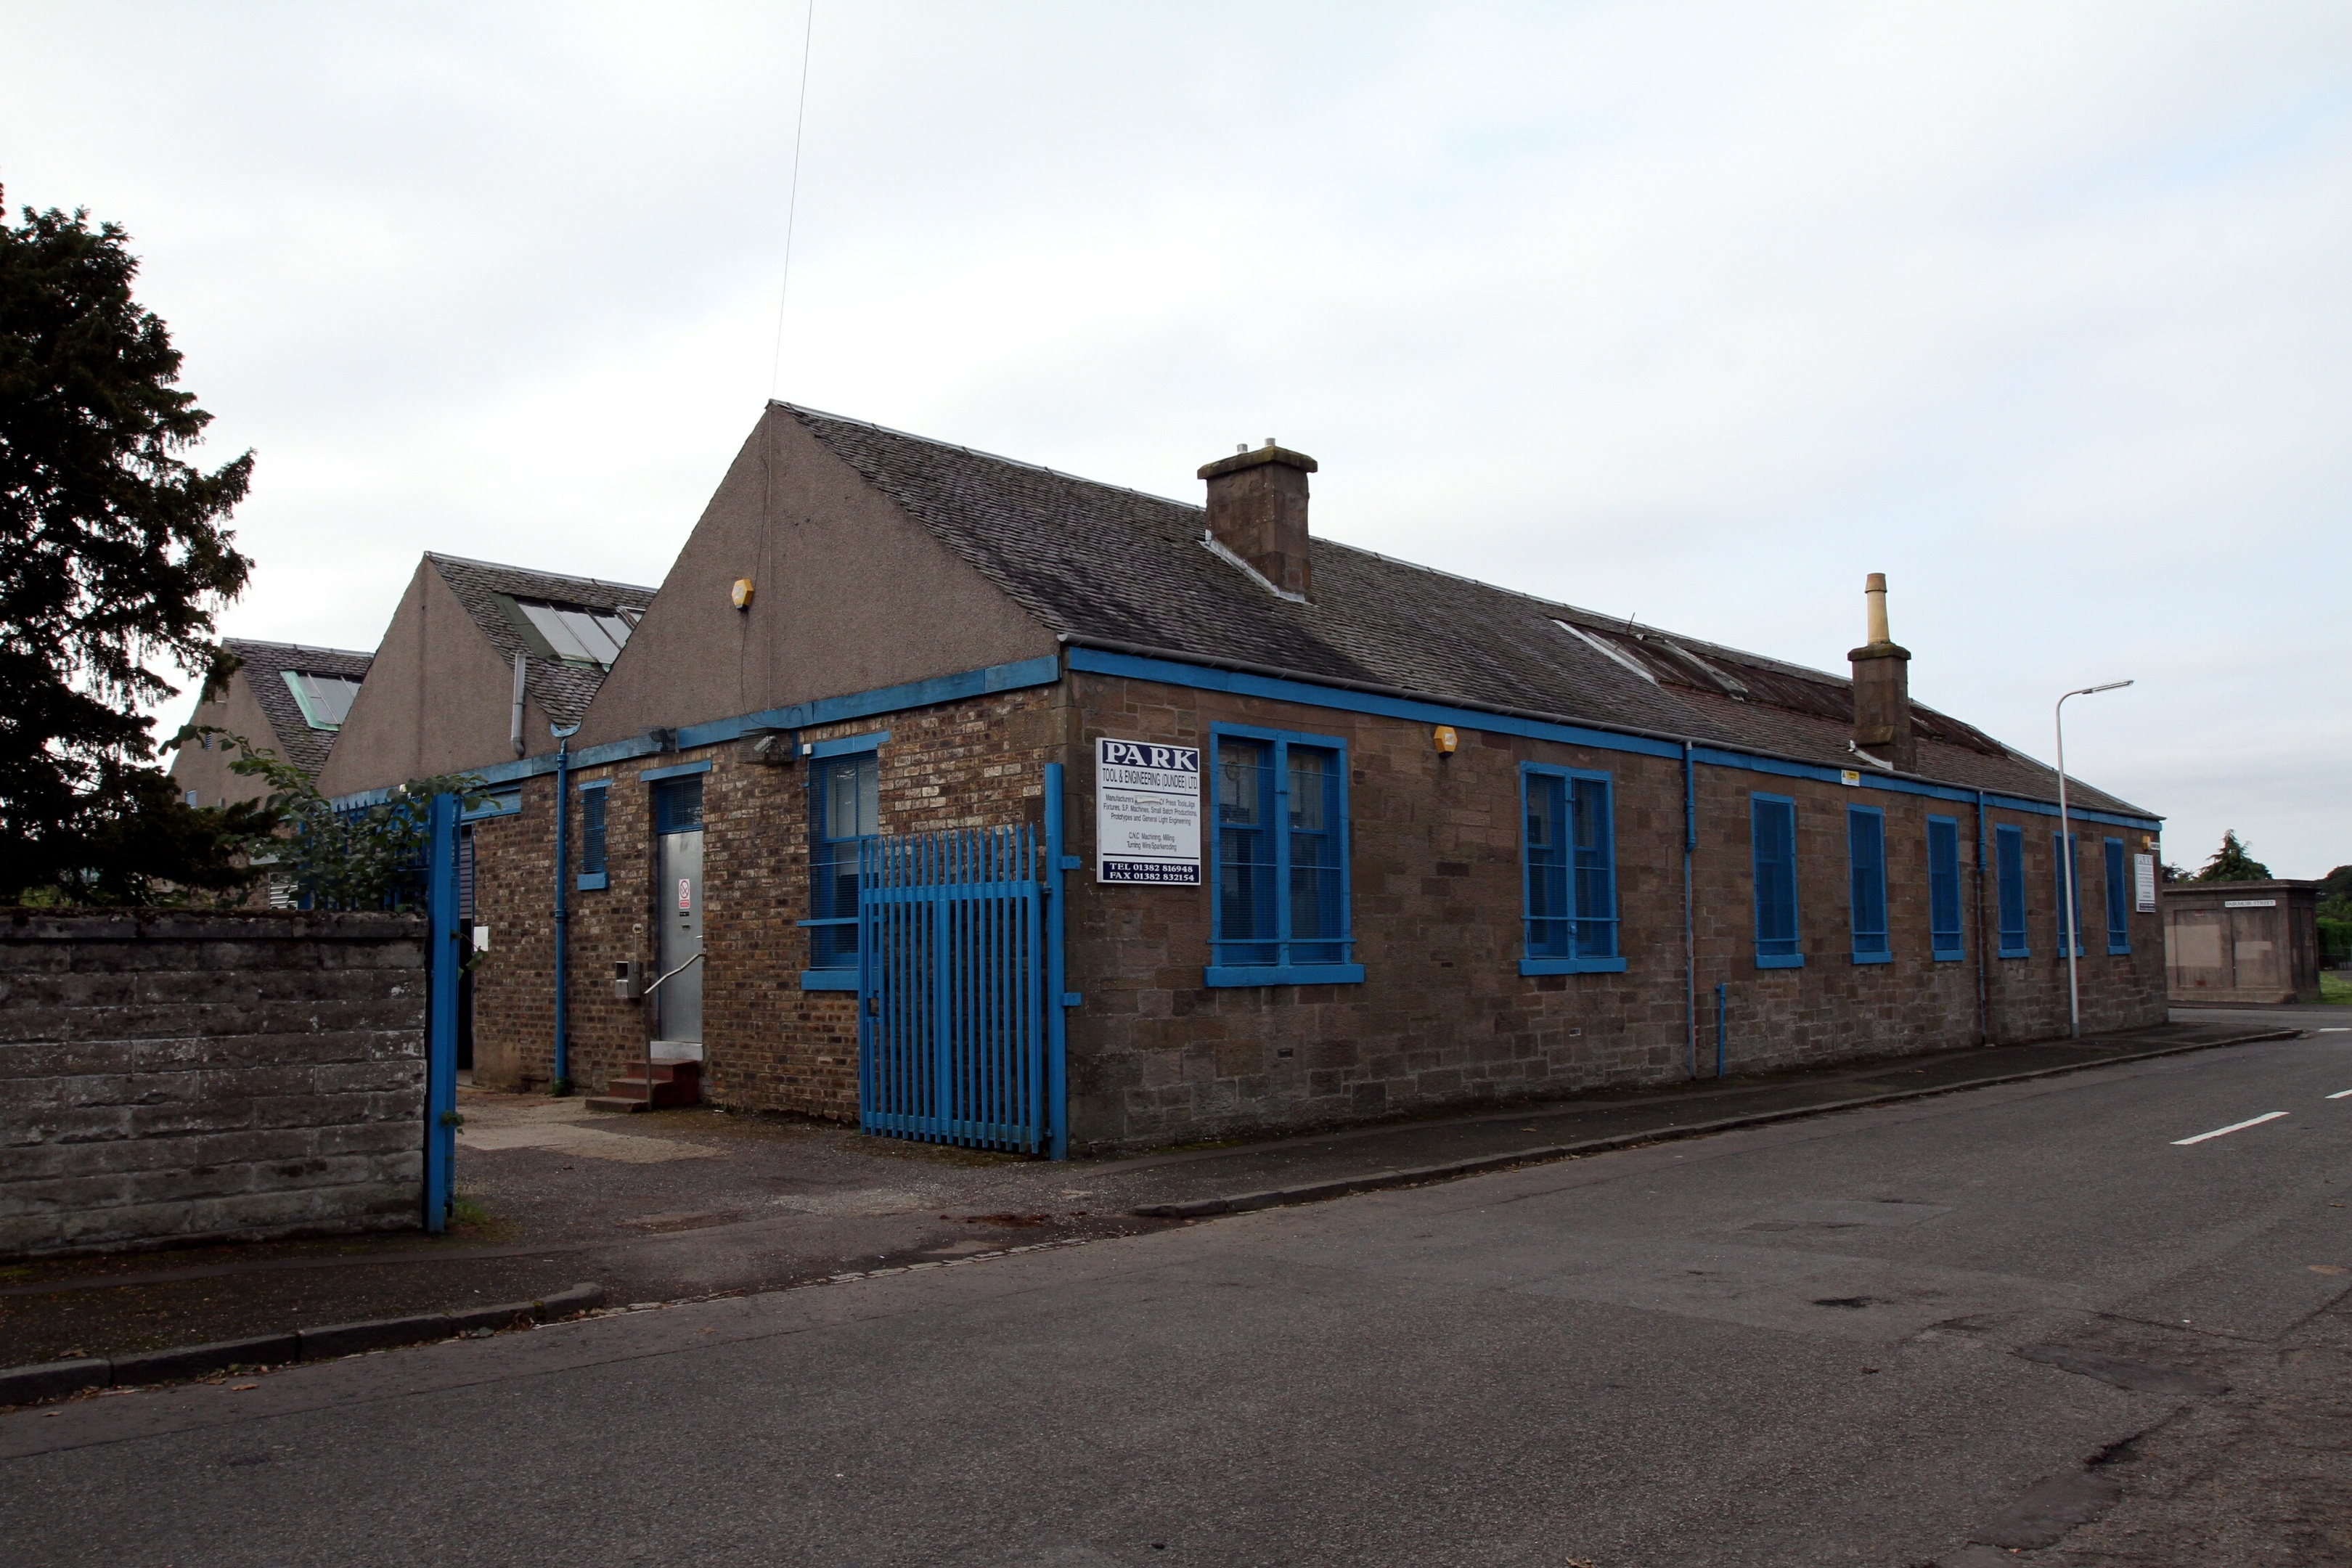 The company's premises on Fairmuir Street